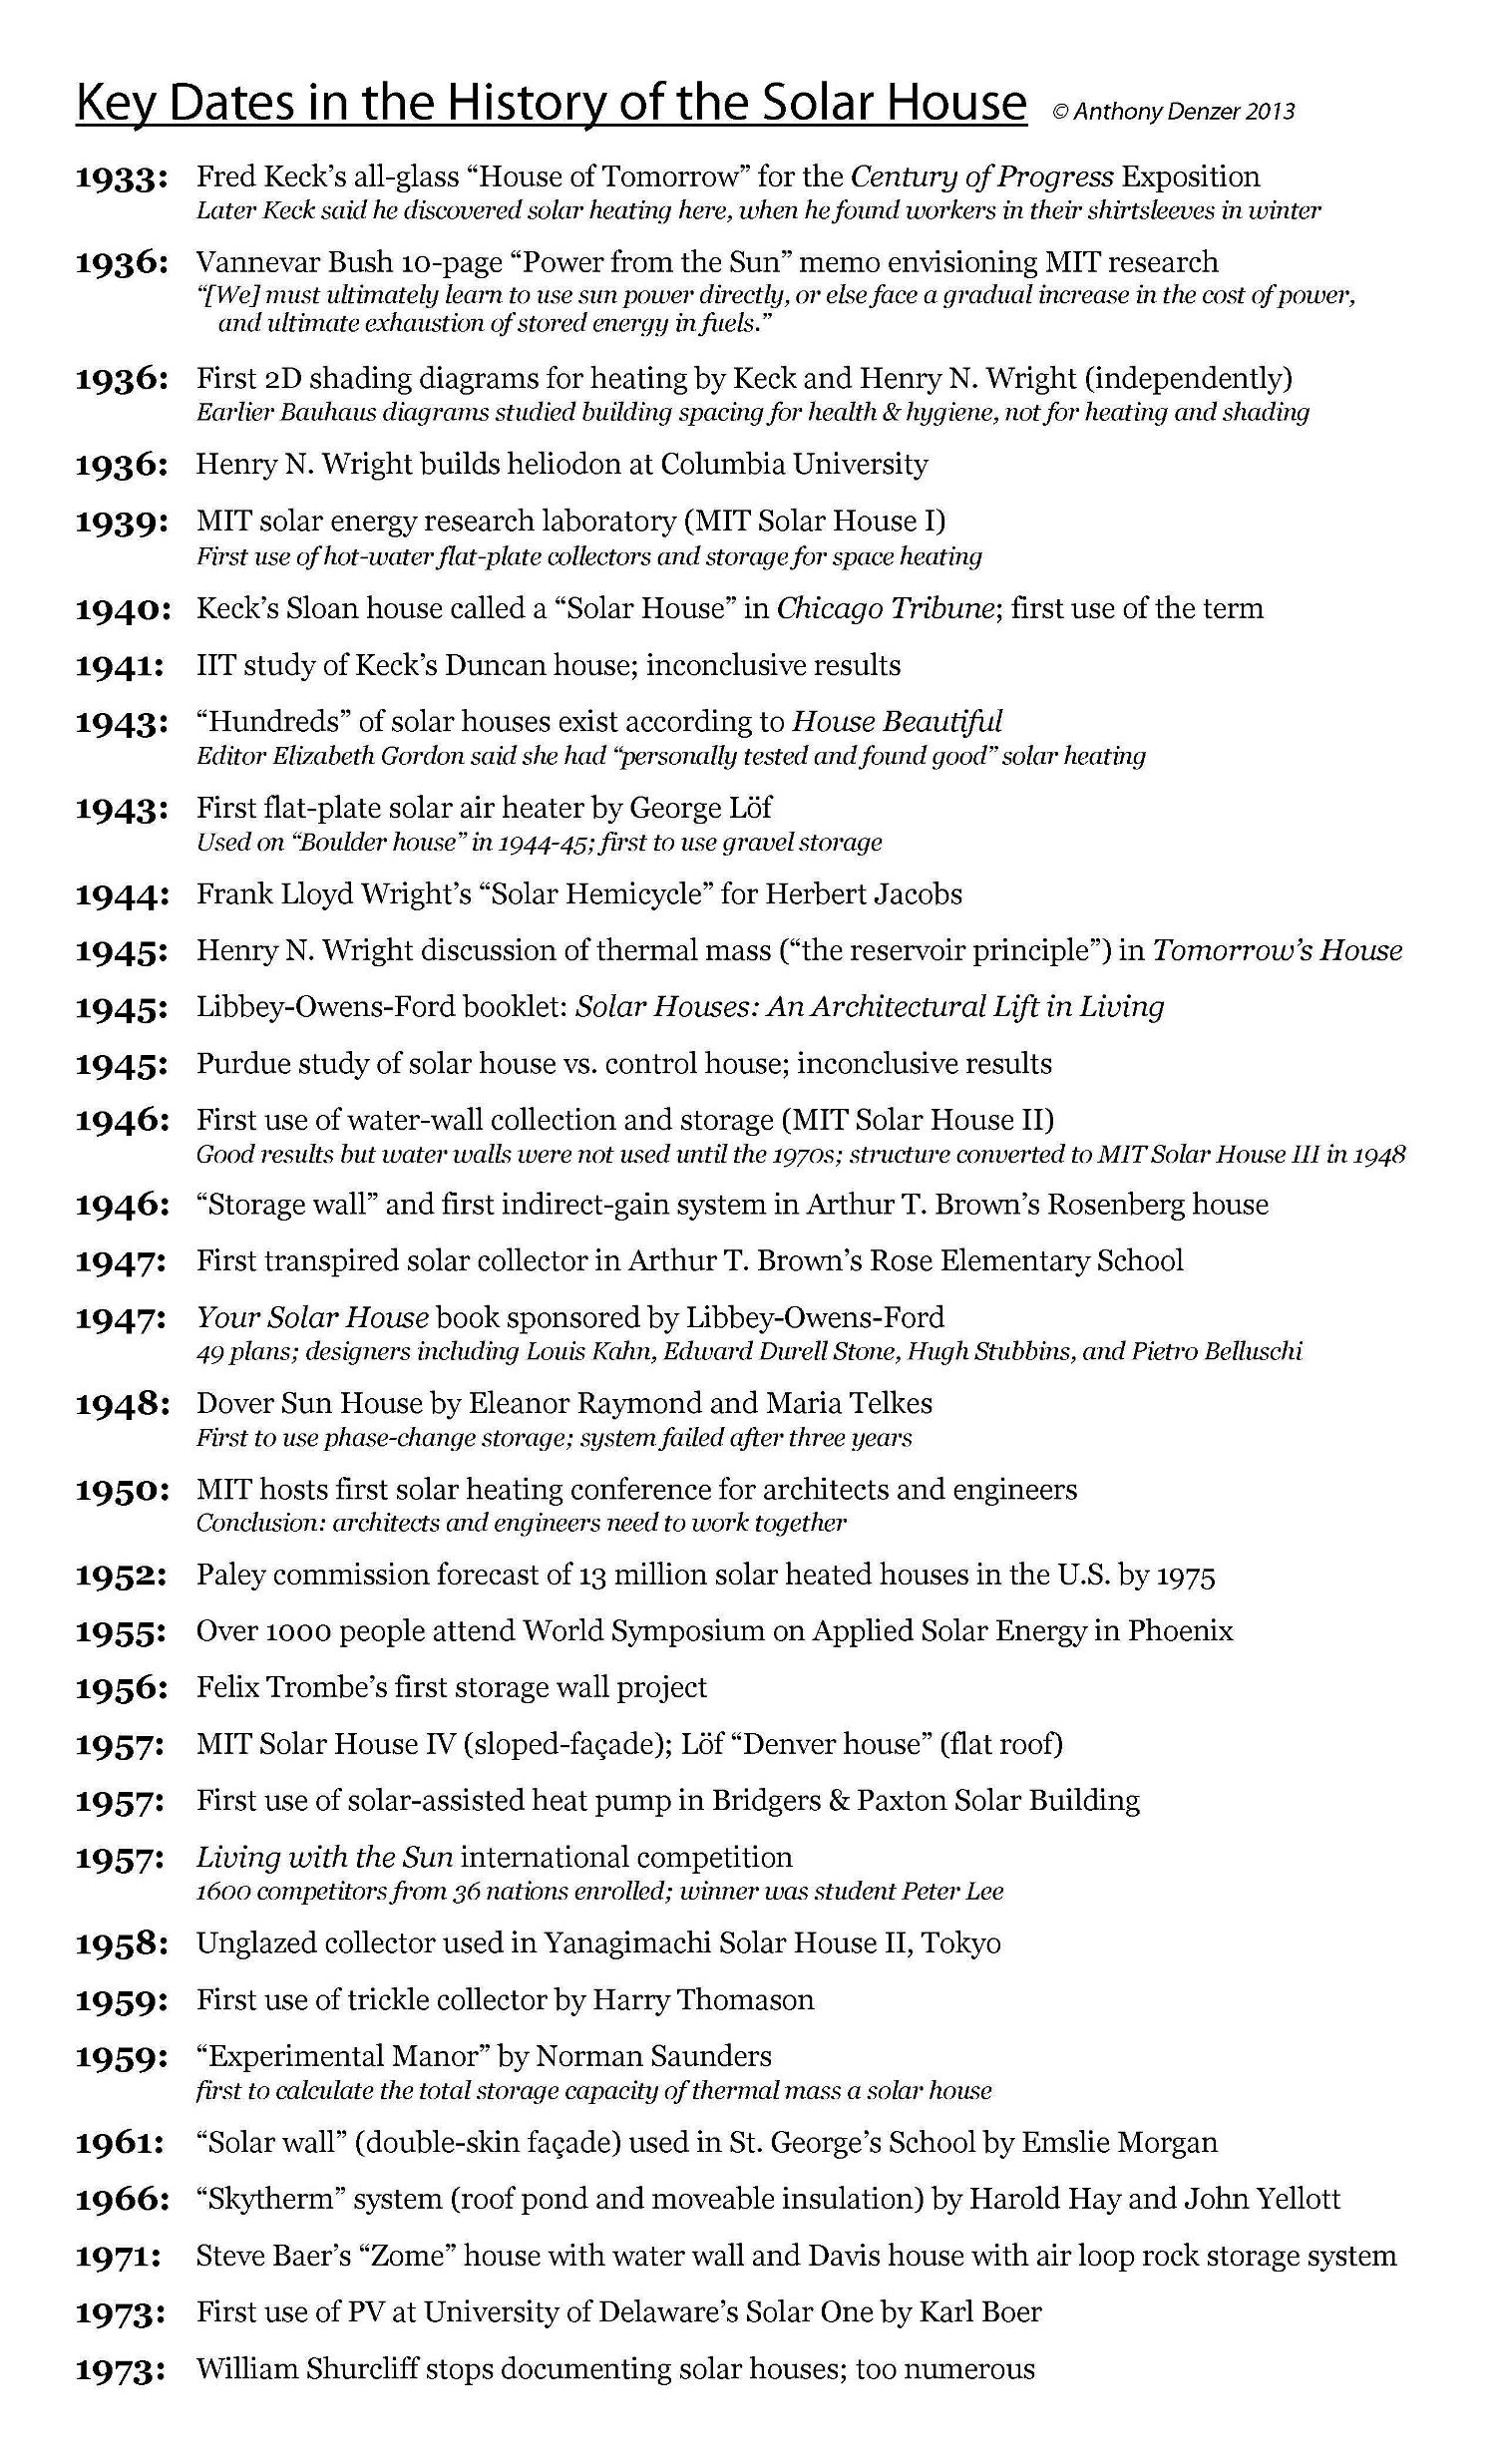 Solar House Timeline 02.jpg